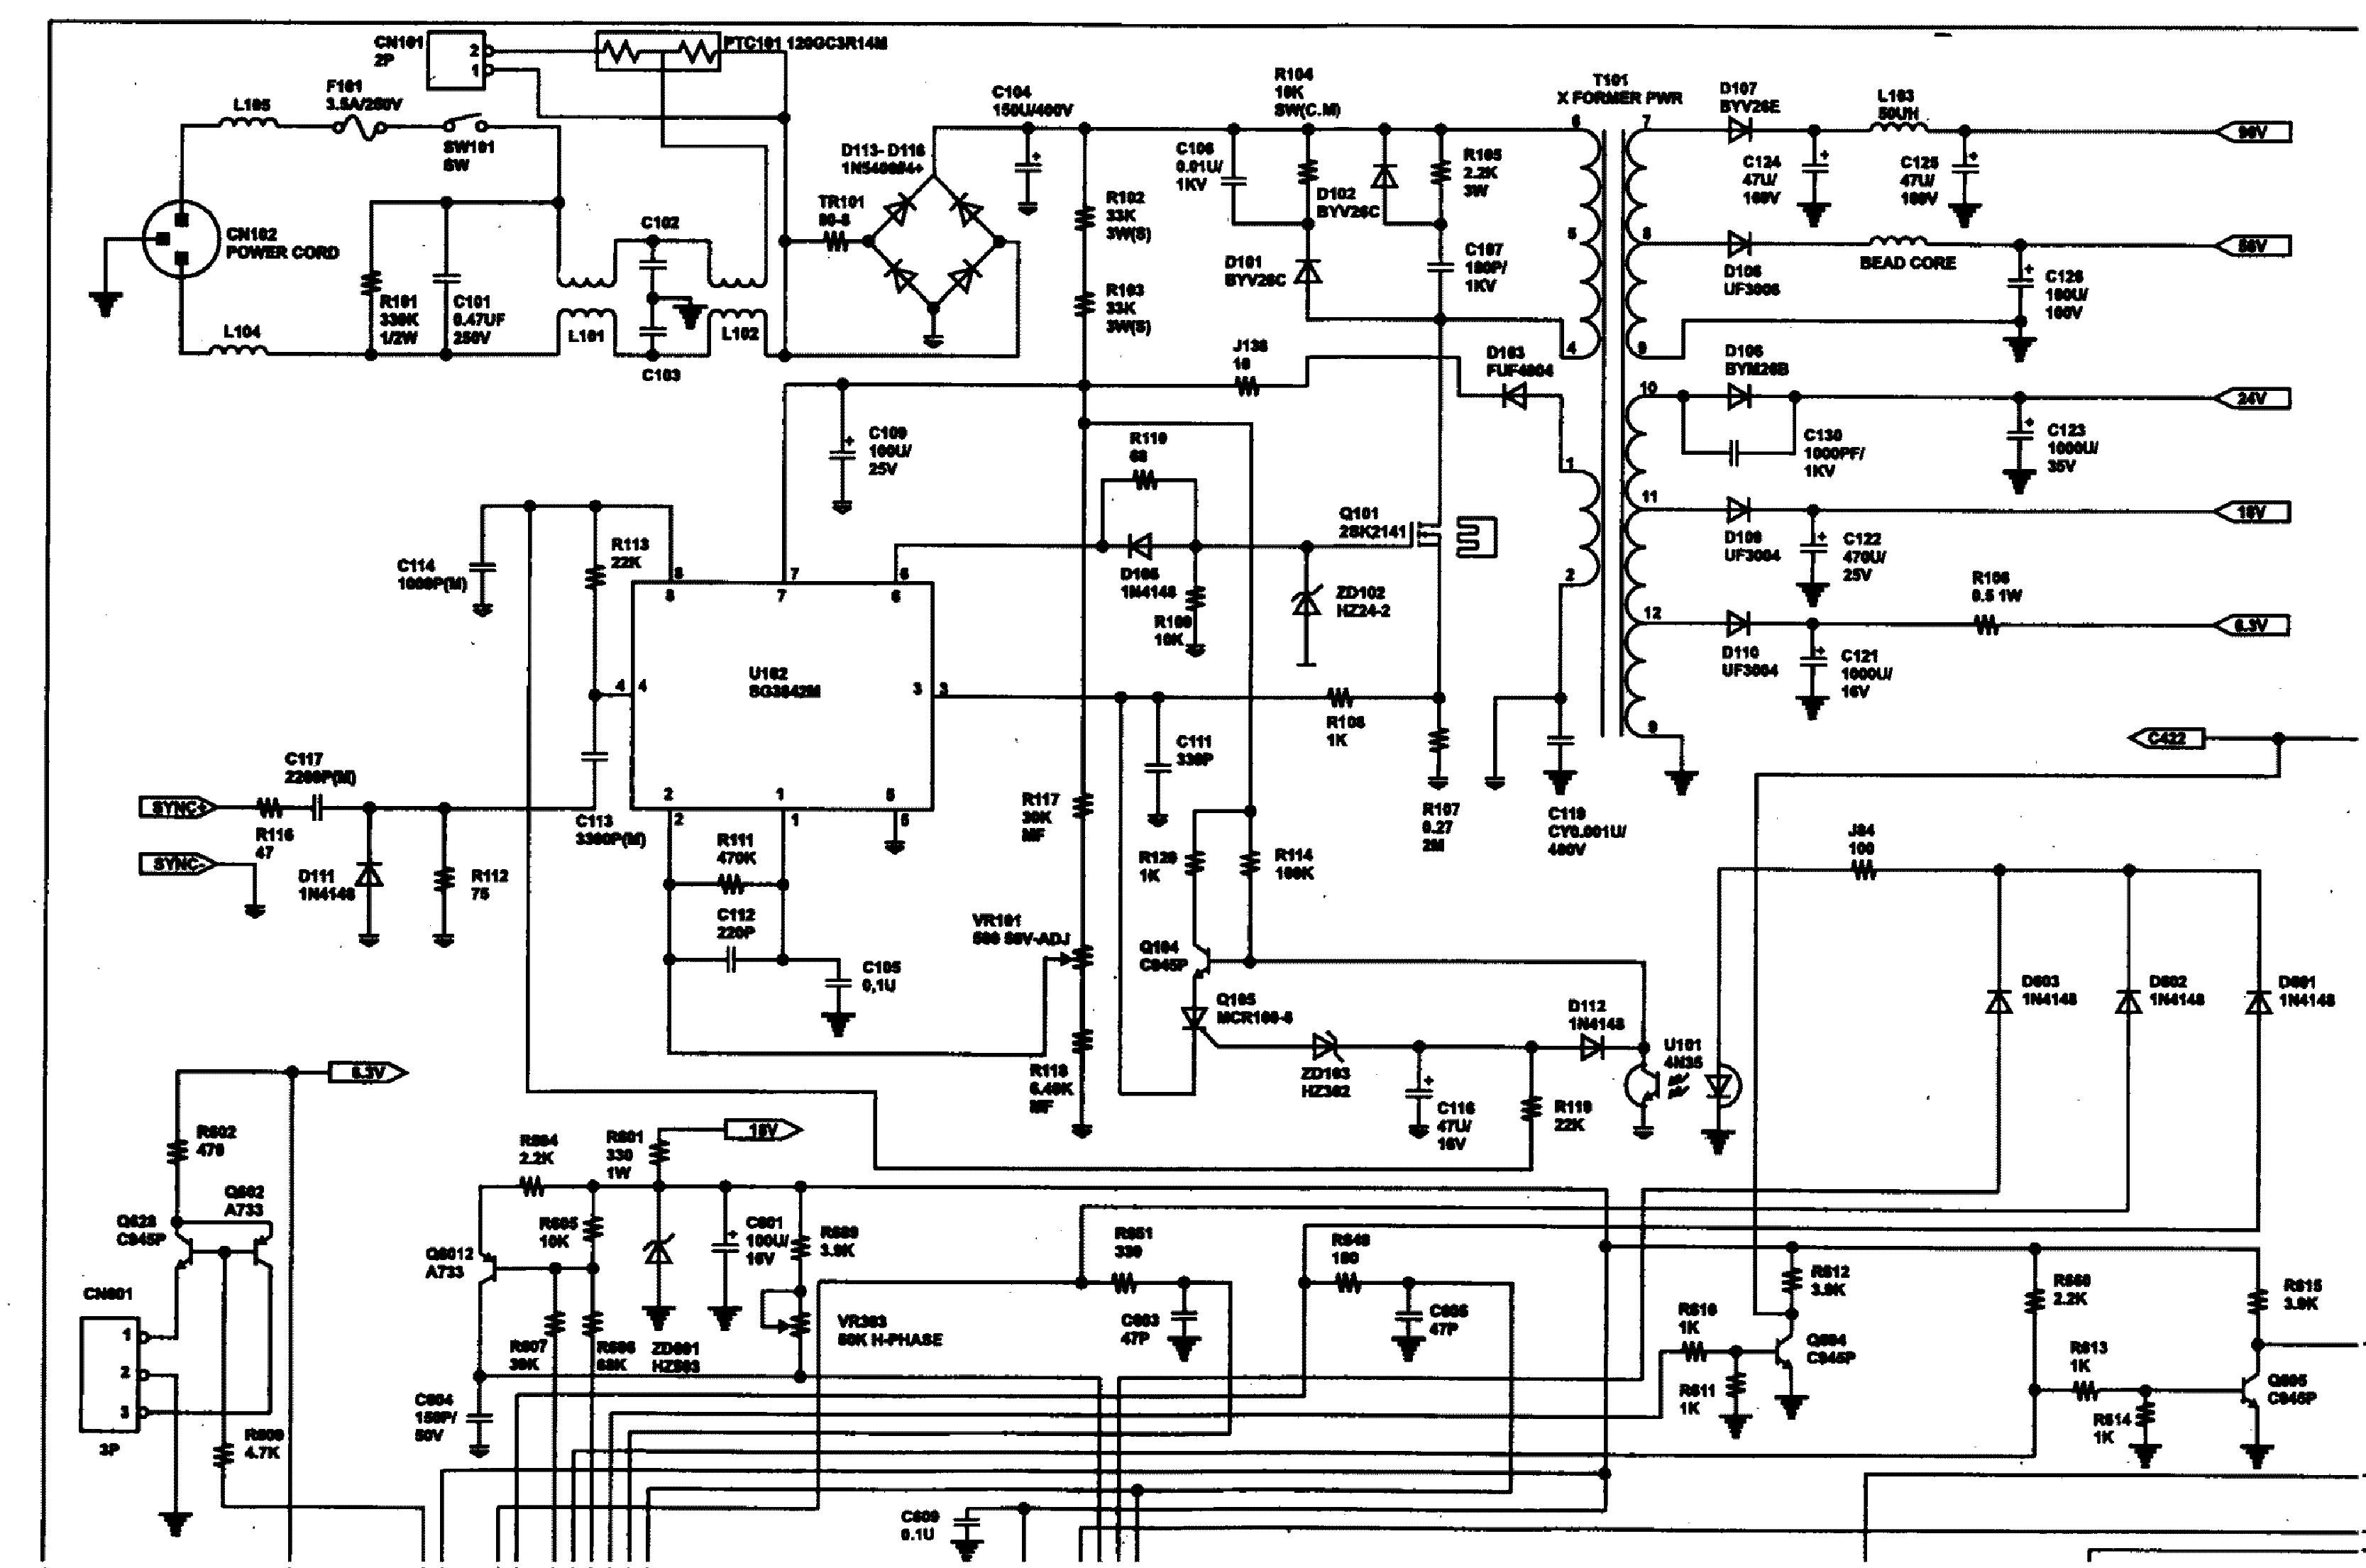 bridge cad451s sch service manual download  schematics  eeprom  repair info for electronics experts